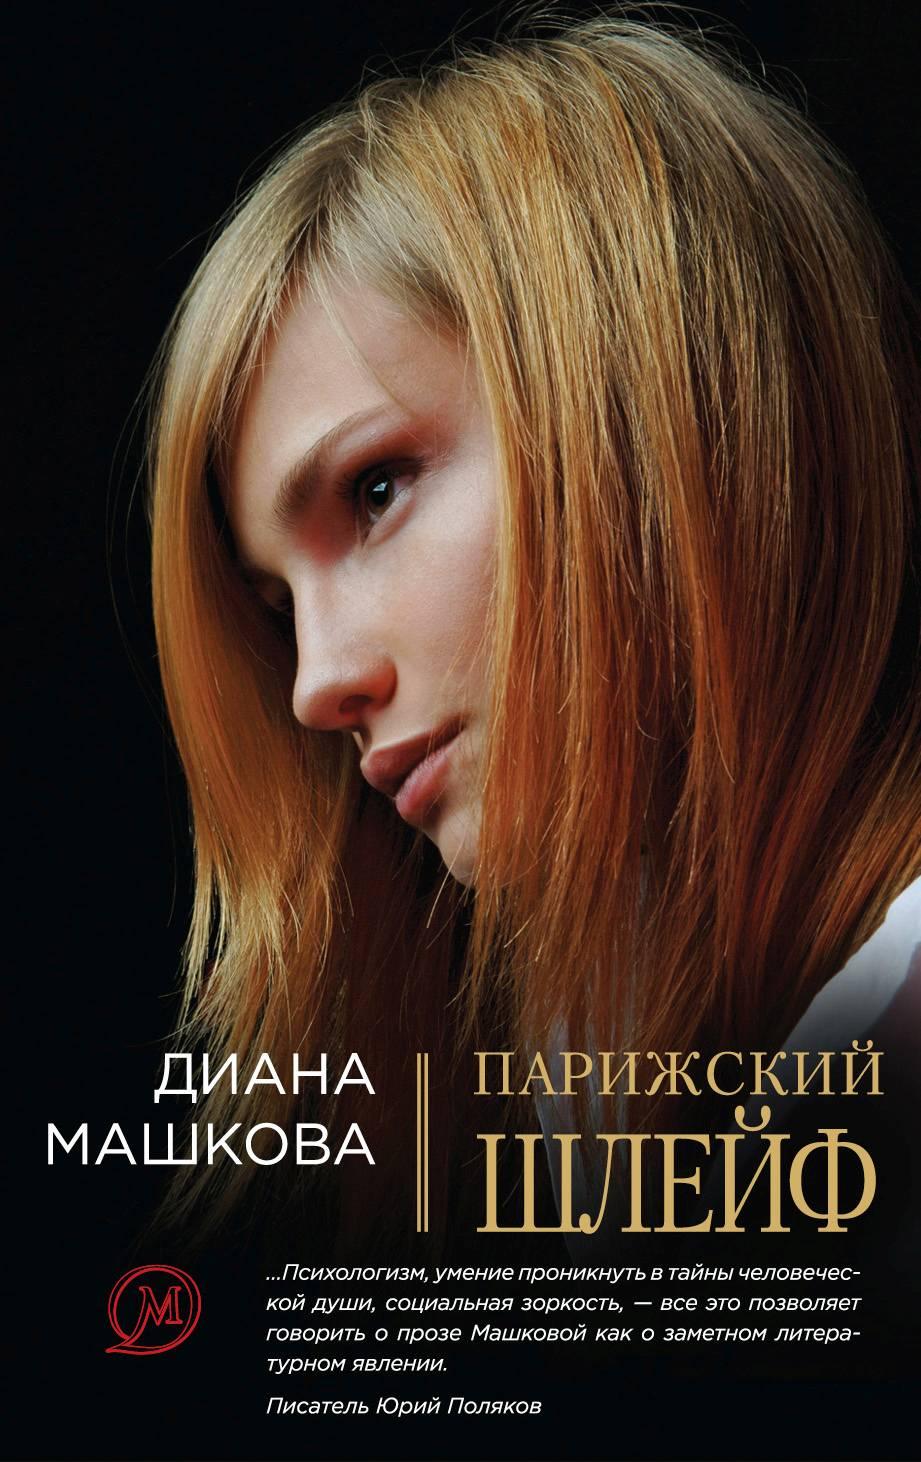 Диана Машкова Парижский шлейф